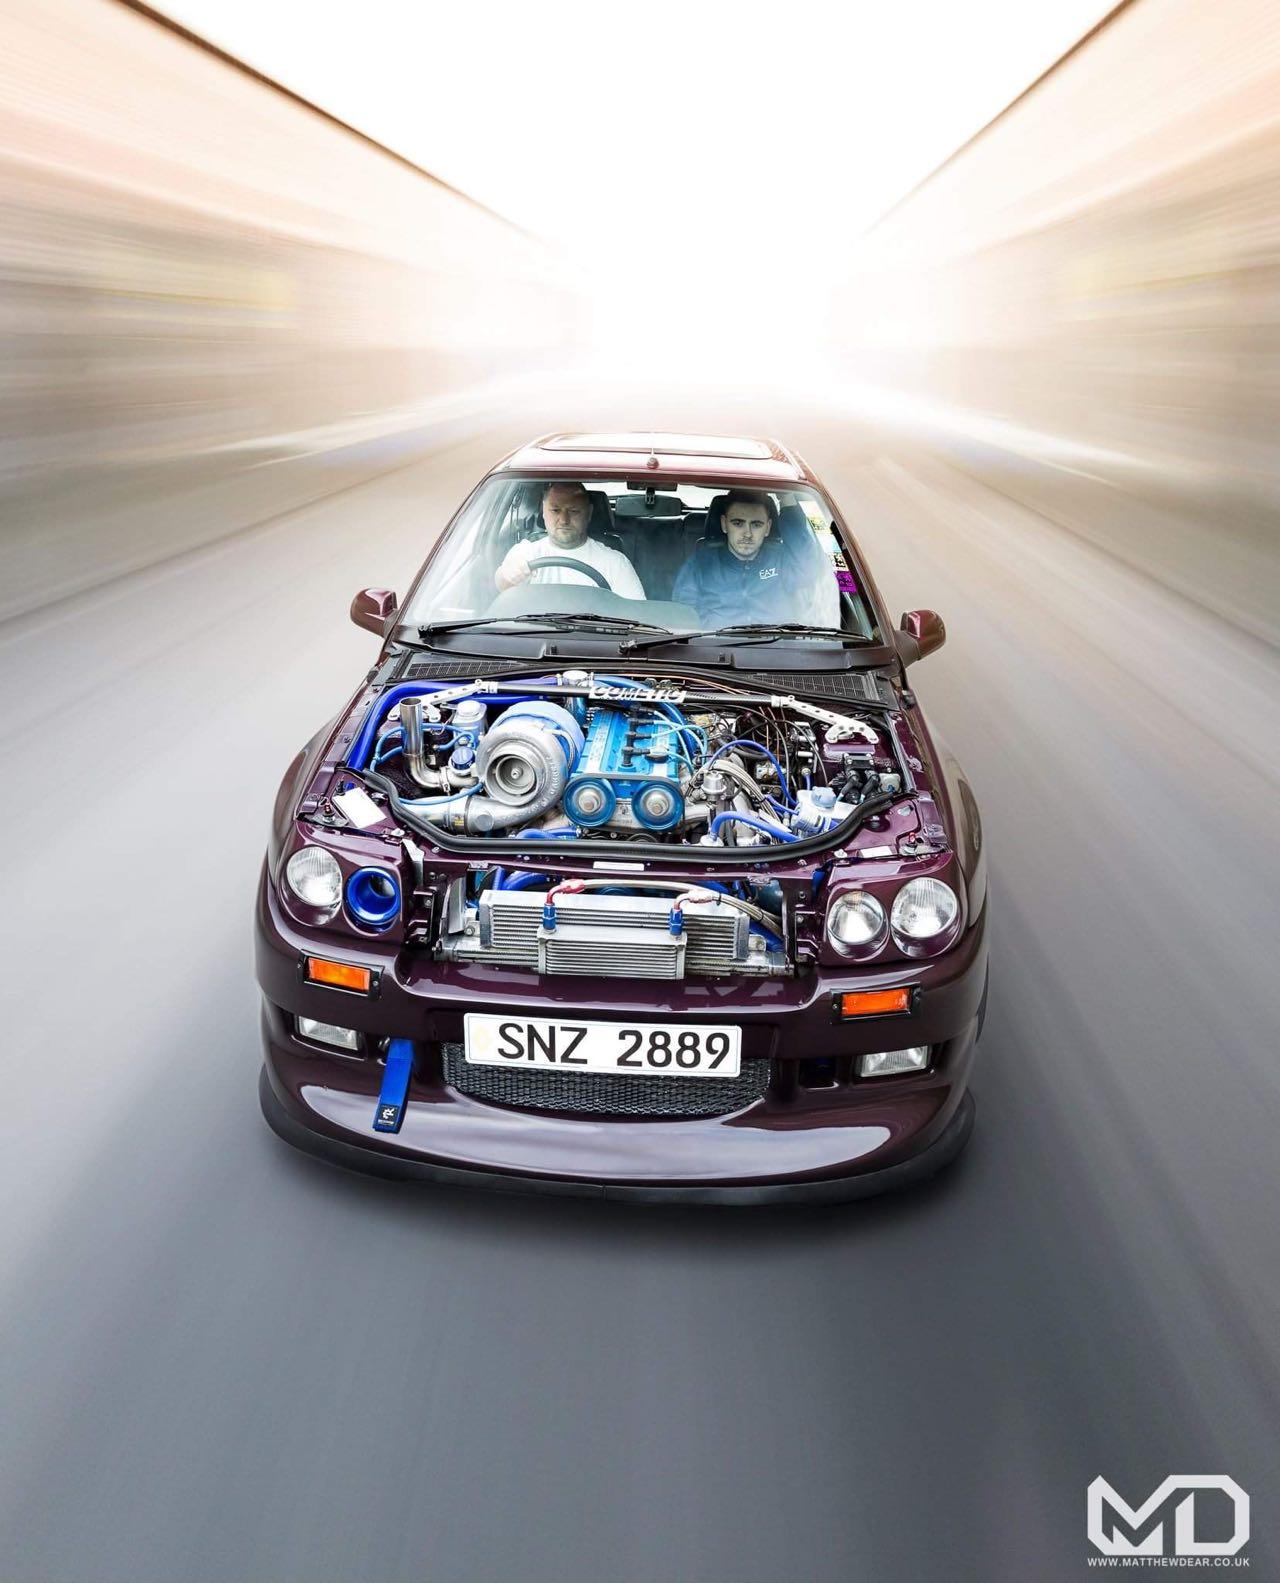 Renault Clio Cosworth... Sont fous ces anglais ! 8